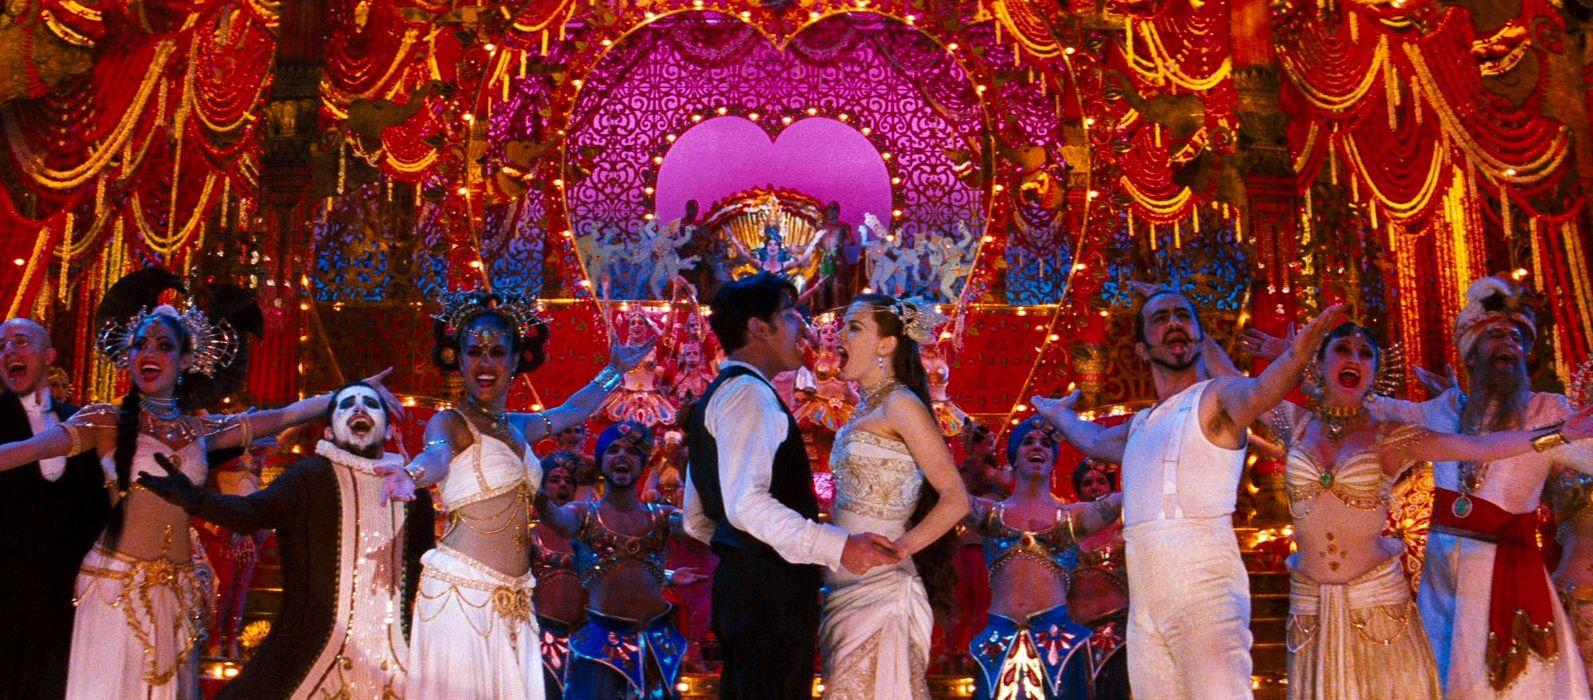 Movie Night - Moulin Rouge - The Dallas Opera